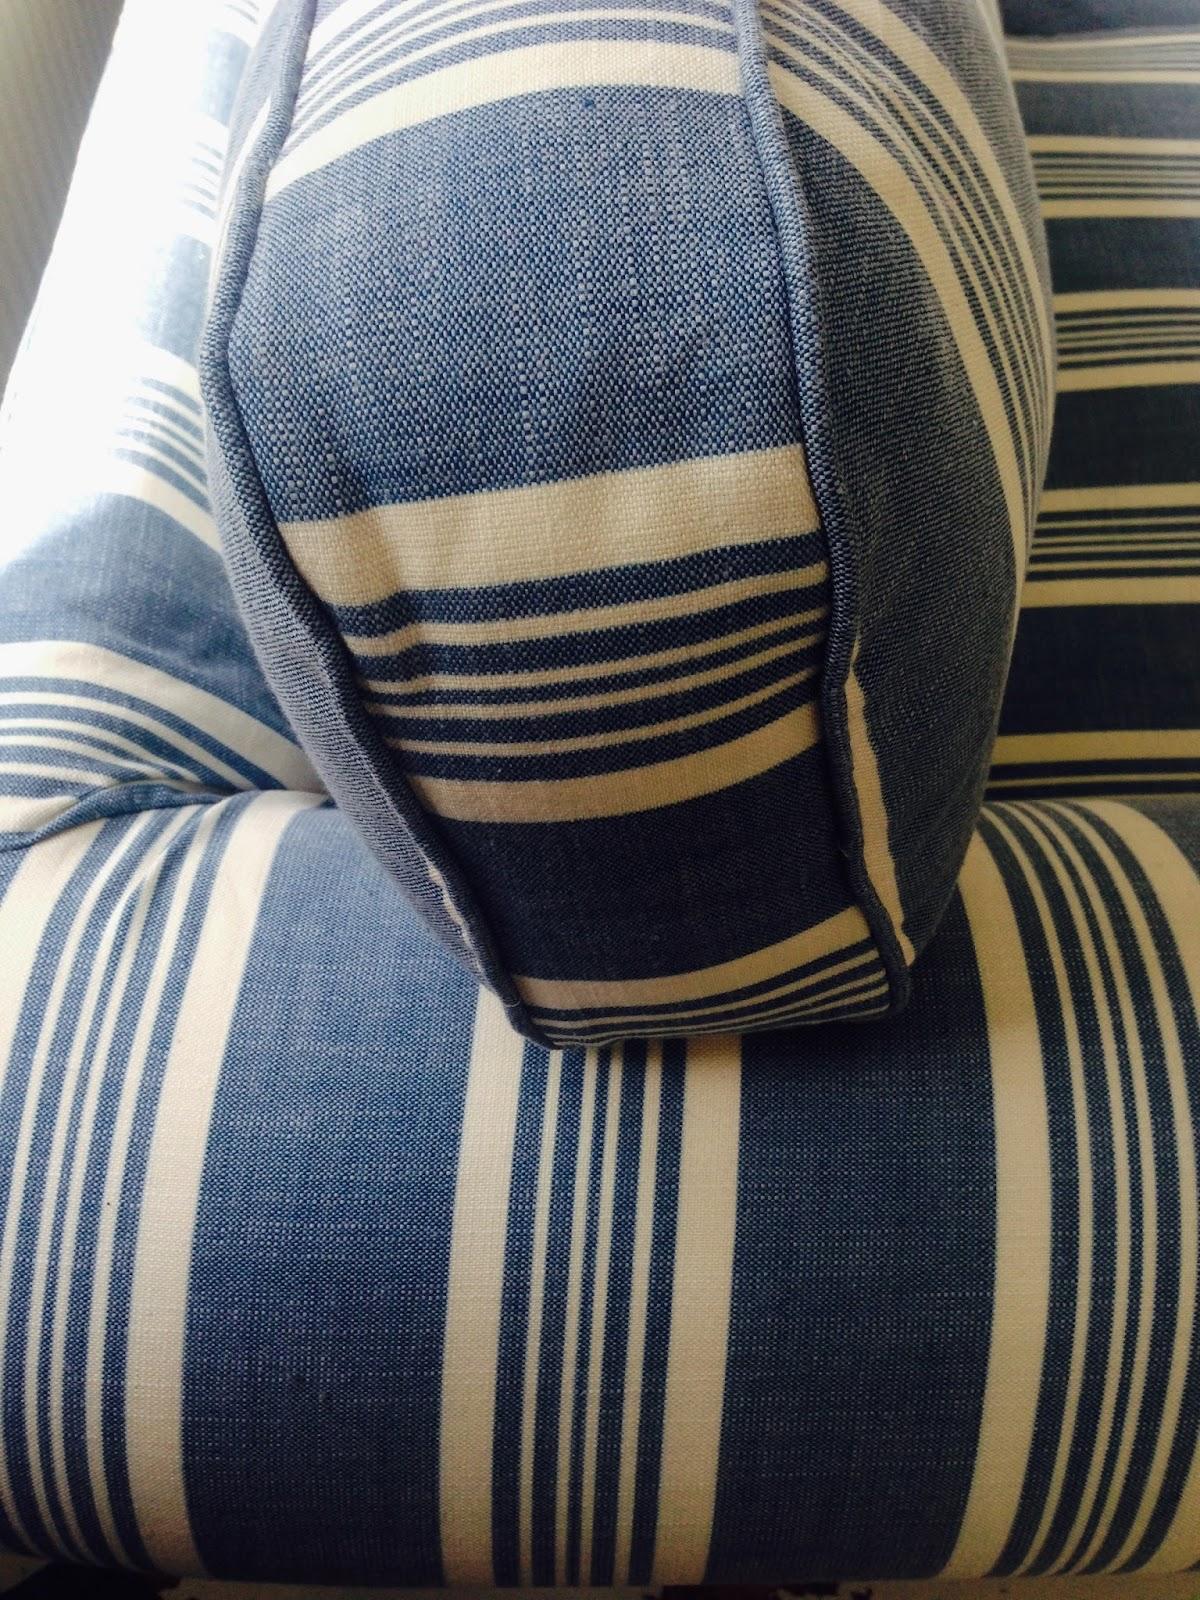 sofasofa reviews davis sofa slipcover the perfect white approach